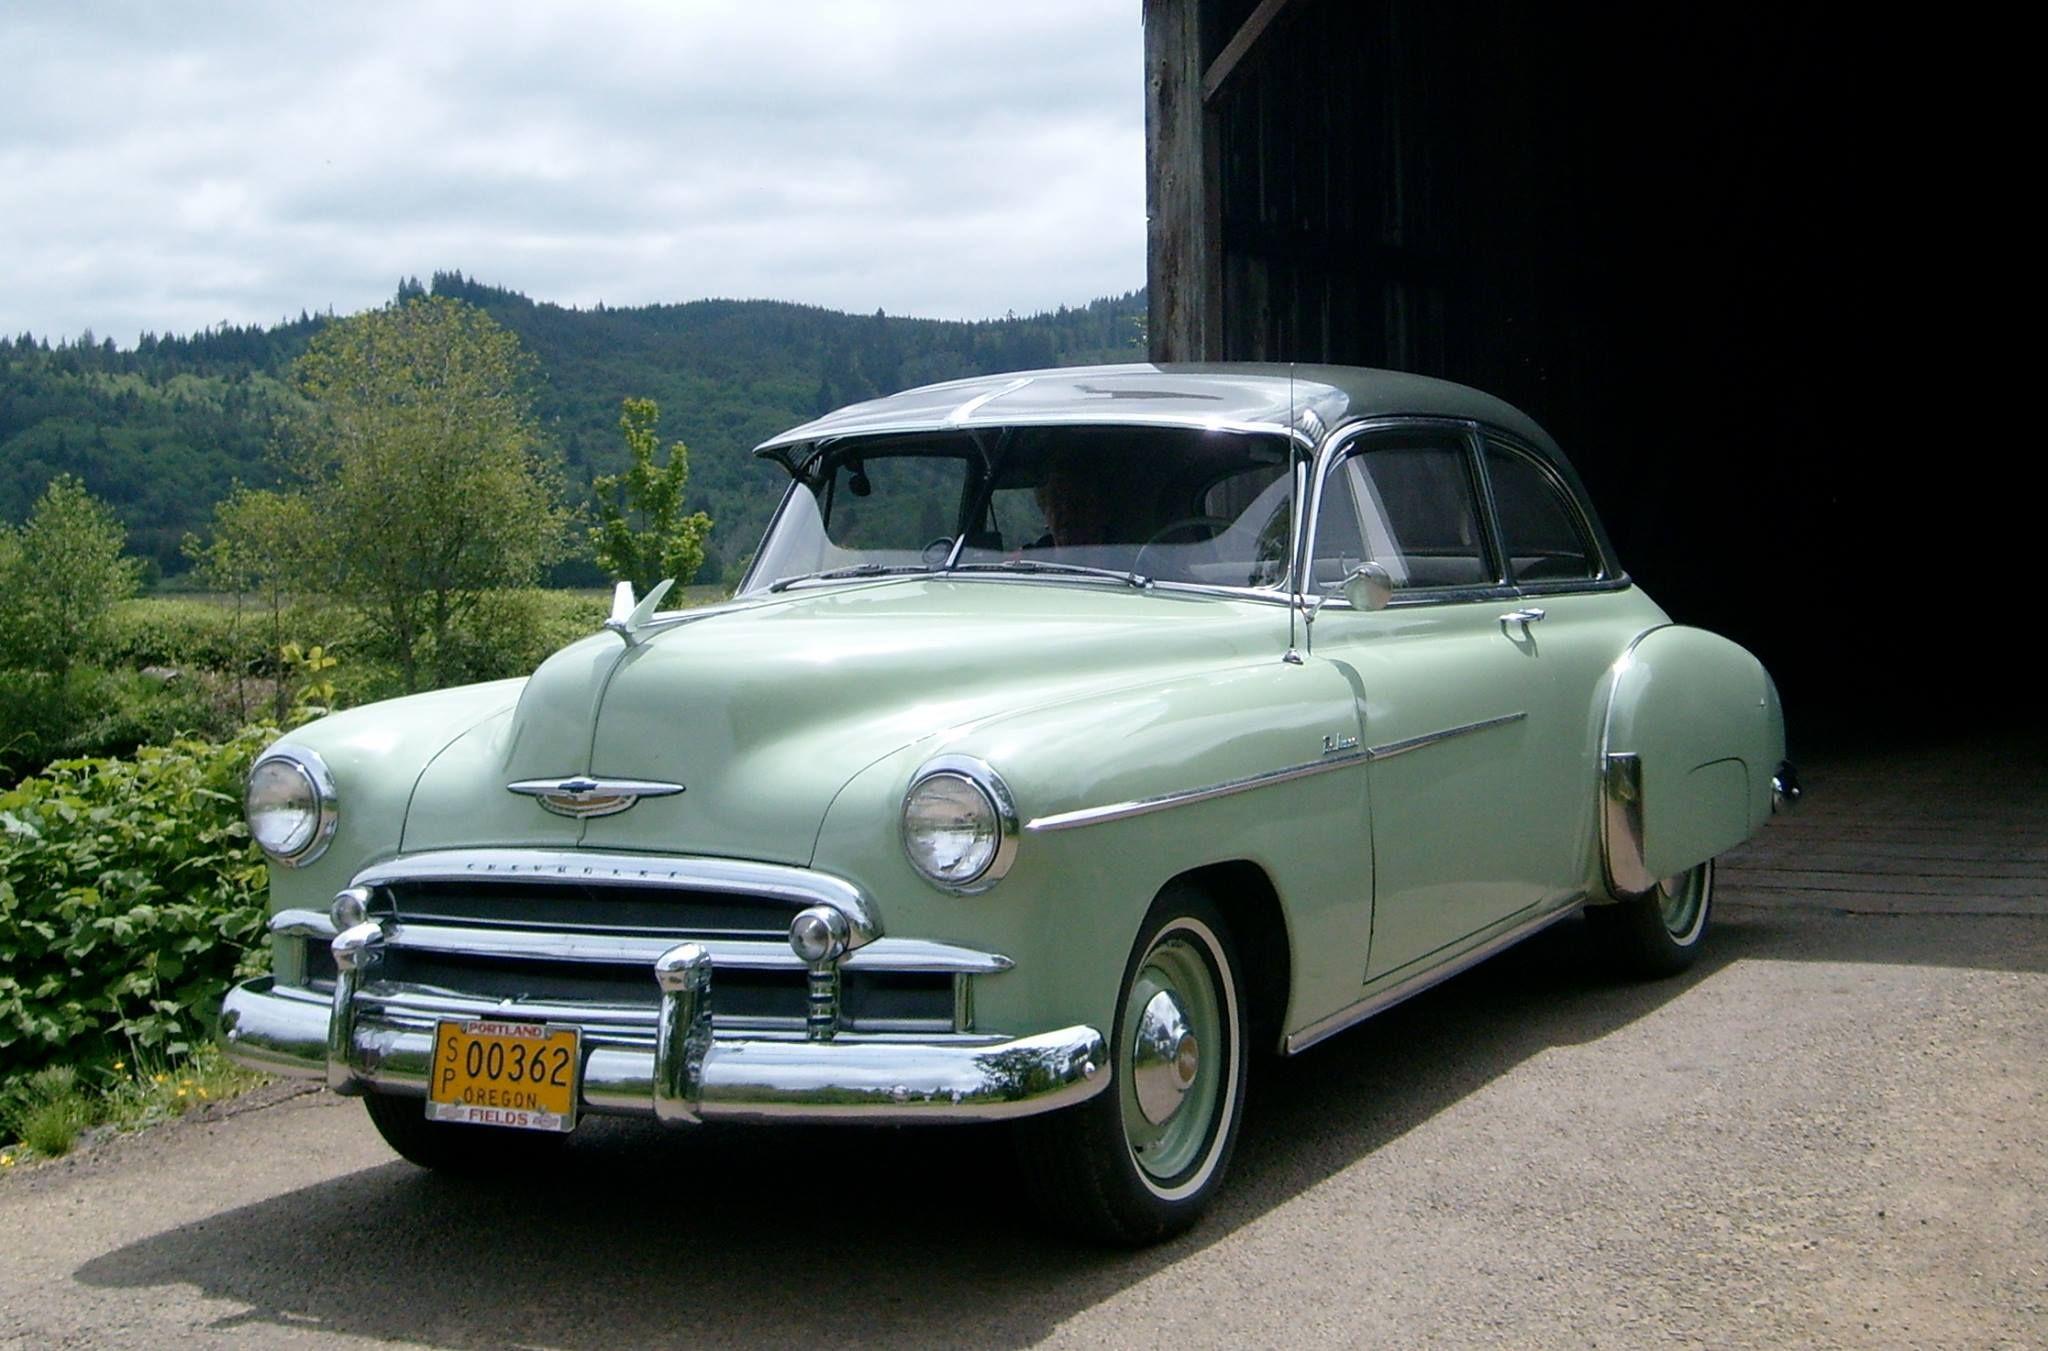 1950 Chevrolet Customline (OR) - $18,900 Contact: Jim 503-368-6517 ...